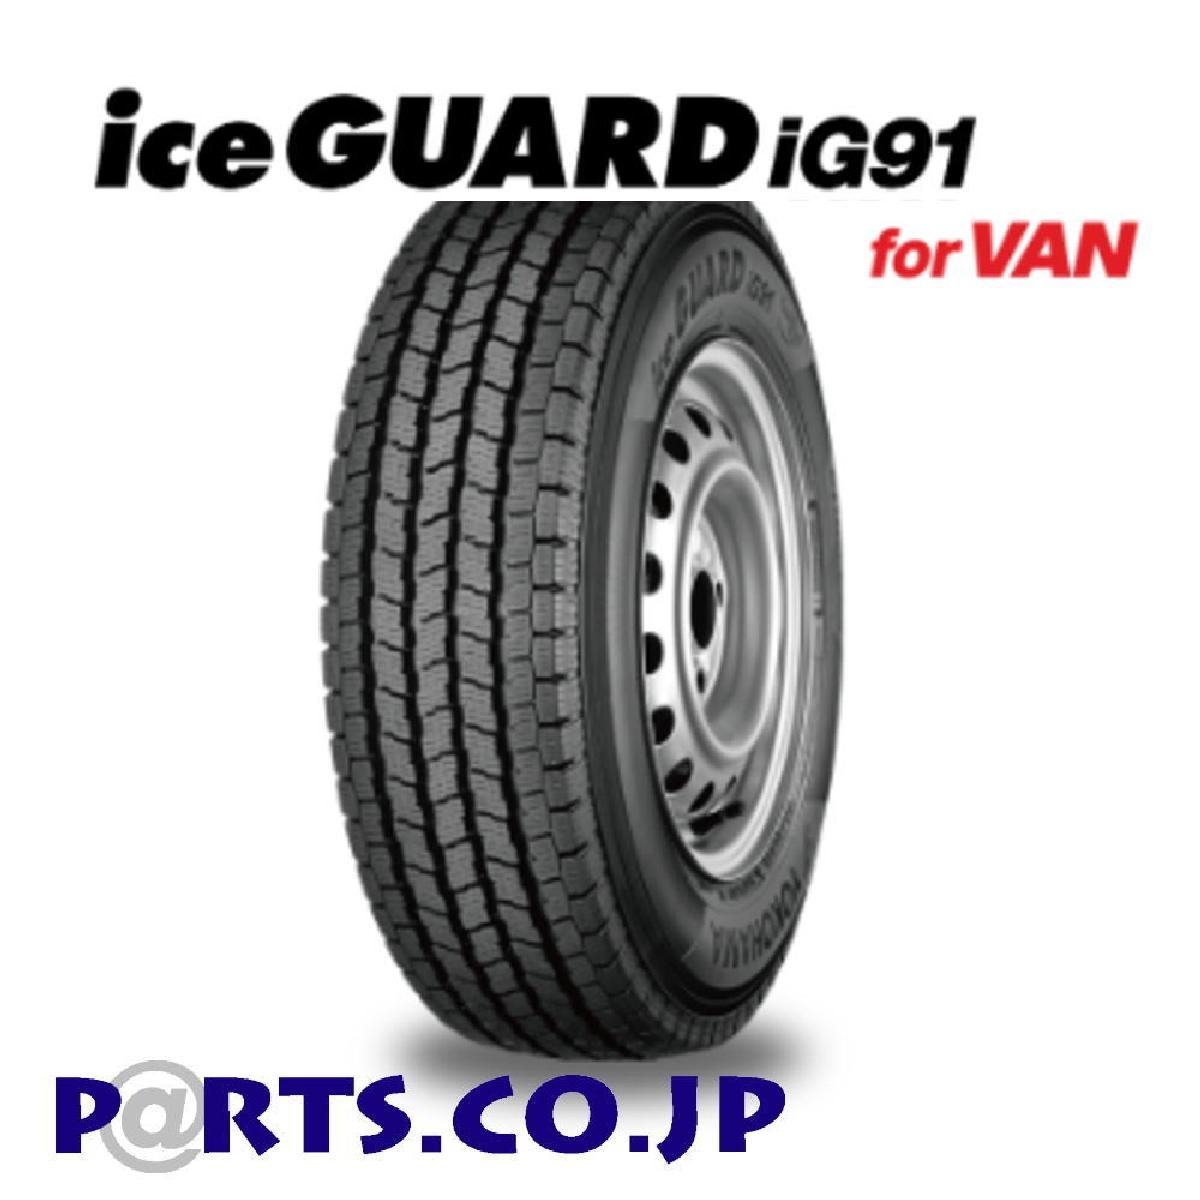 YOKOHAMA ヨコハマ iceGUARD iG91 for 大放出セール 185 95N VAN 80R14 97 市販